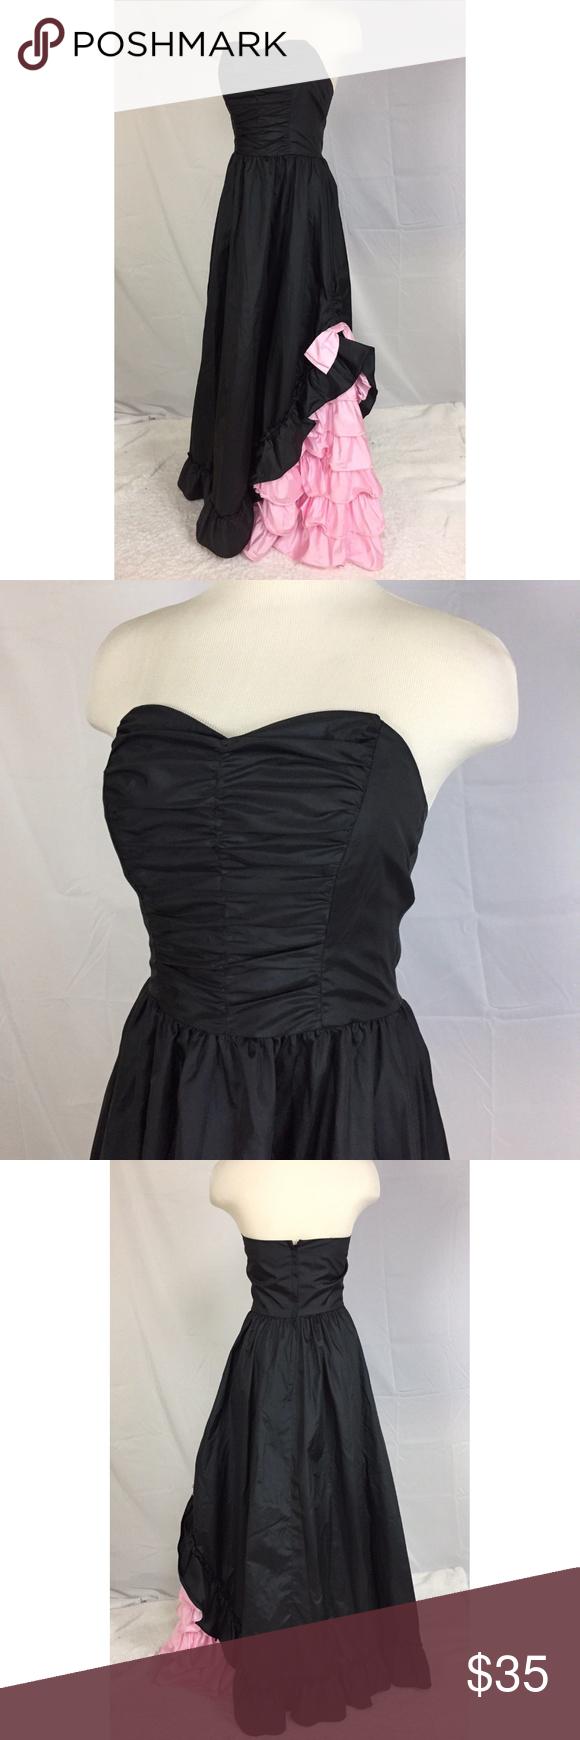 Evening prom dress s strapless black pink my posh picks